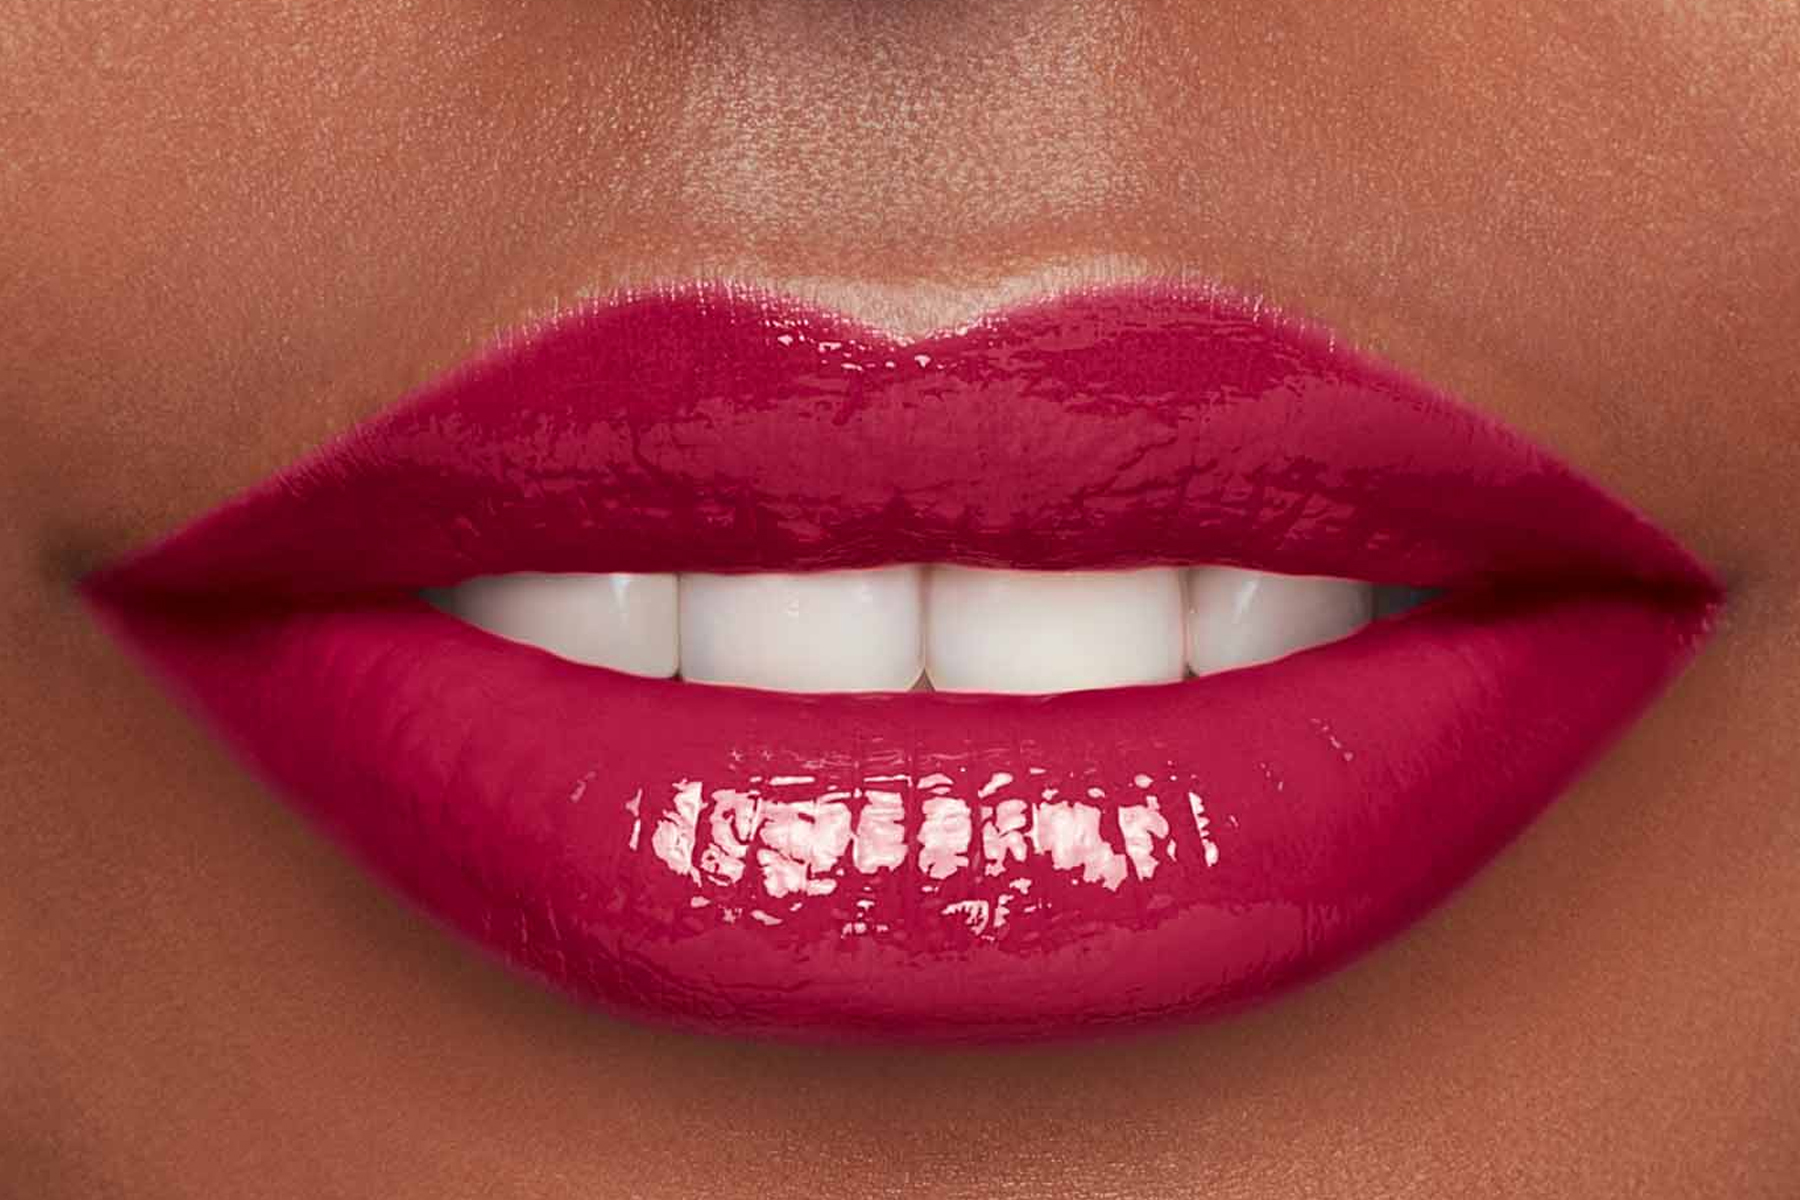 Clarins-lip-comfort-oil-intense-swatch-intense-fuchsia